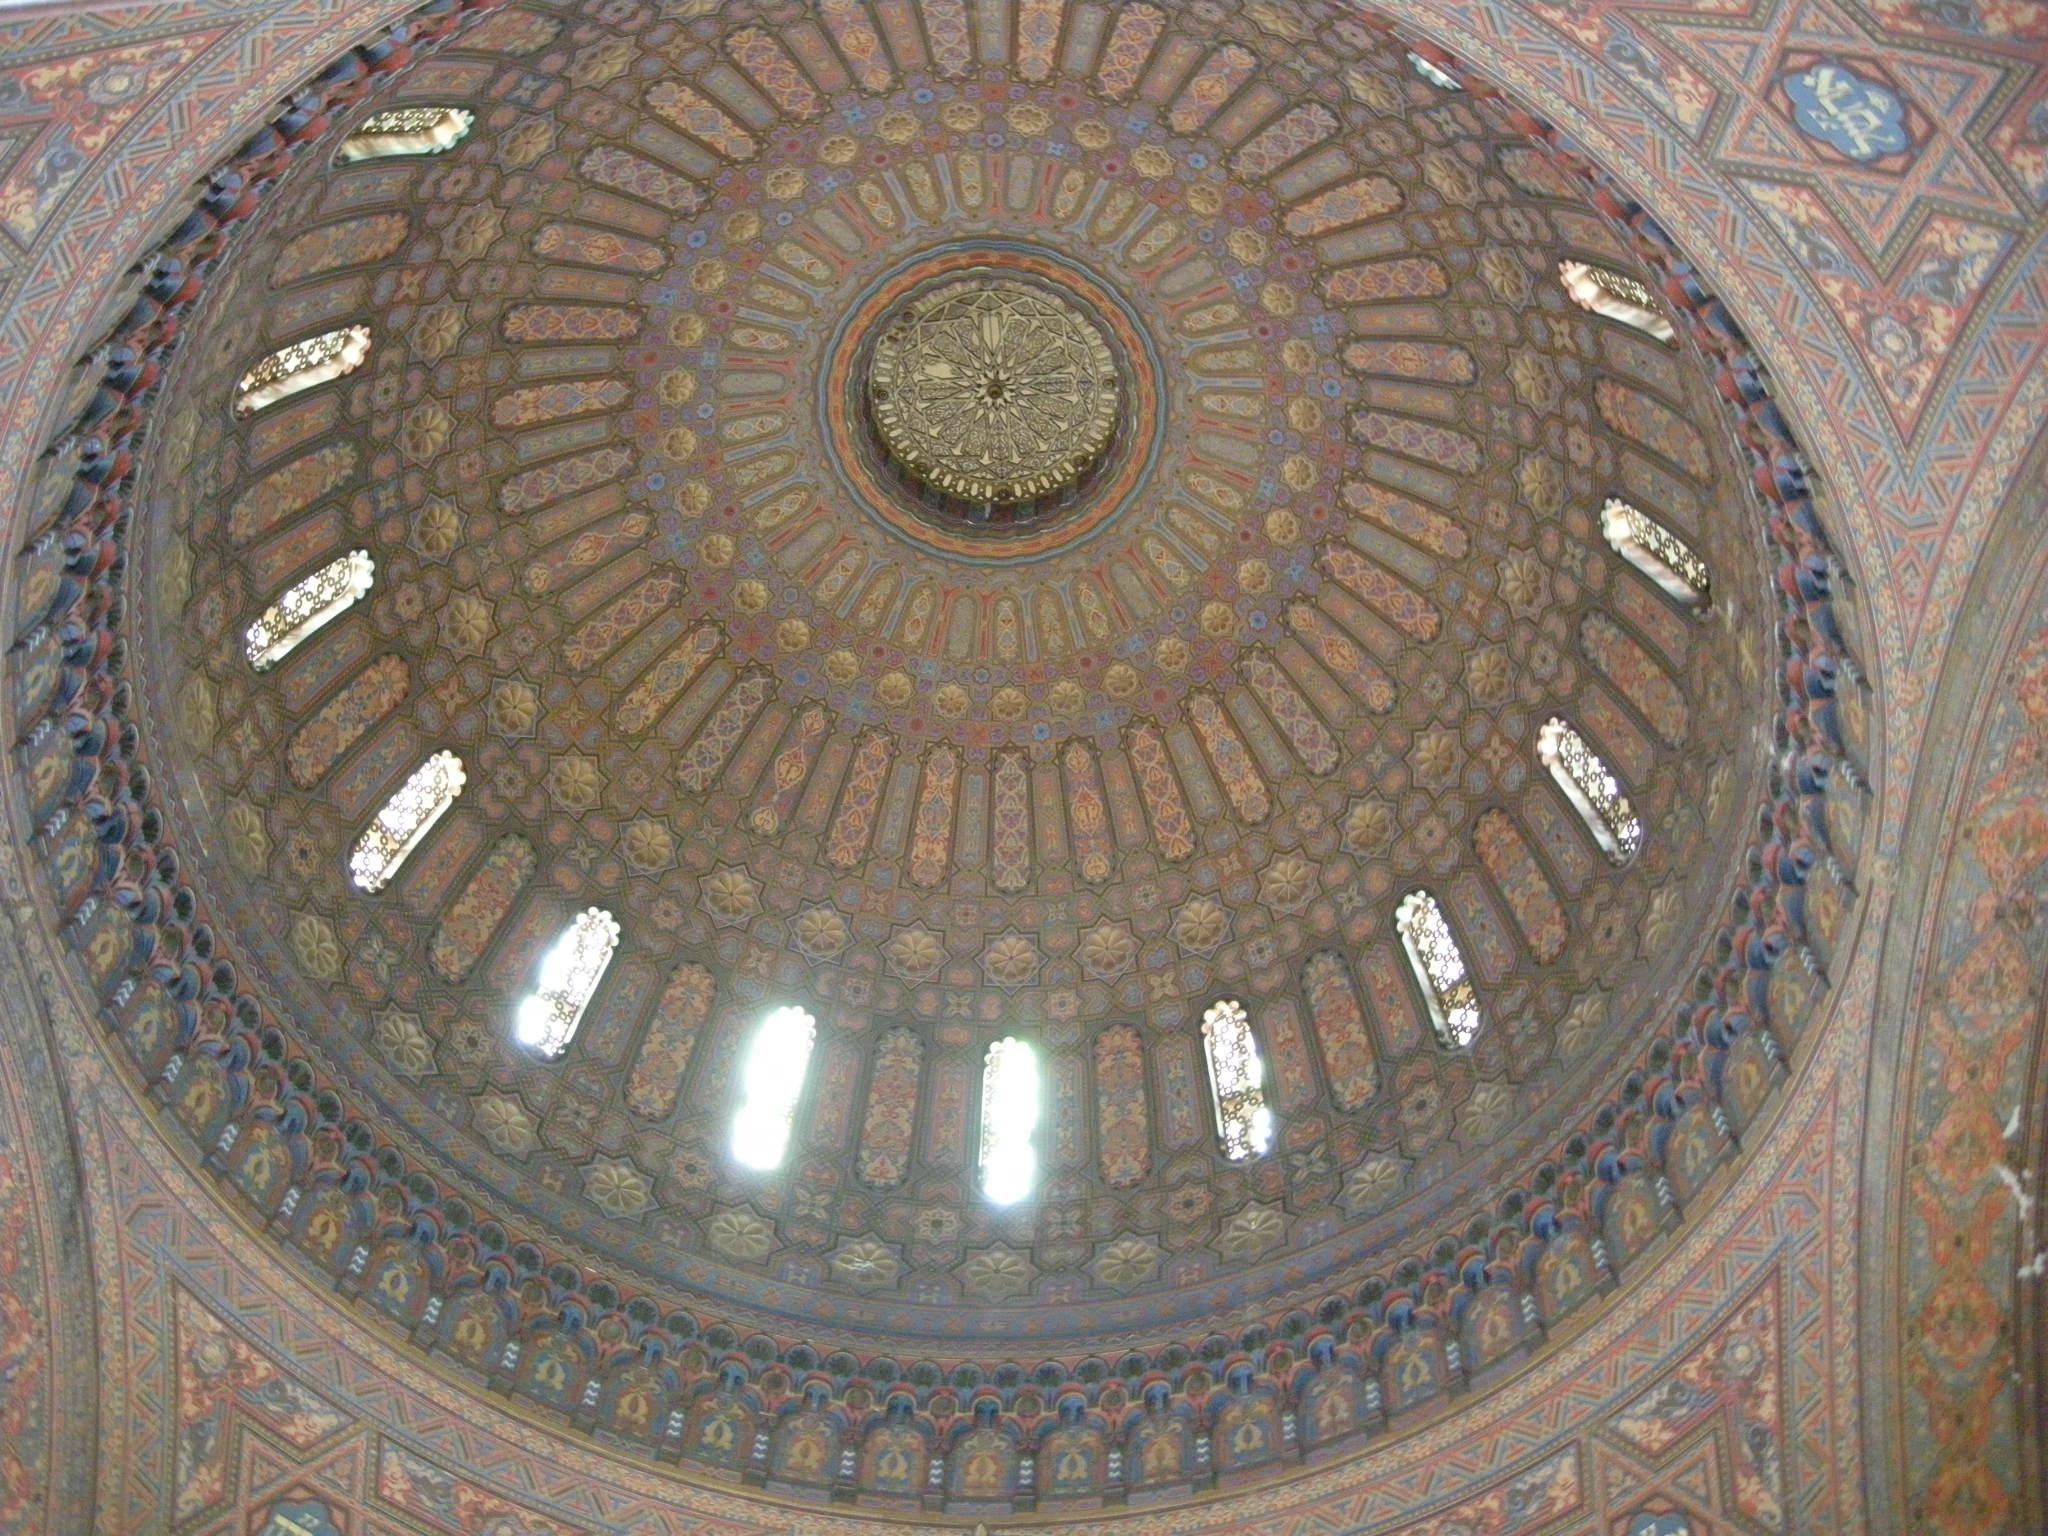 2_Sinagoga_di_firenze,_interno,_cupola_02